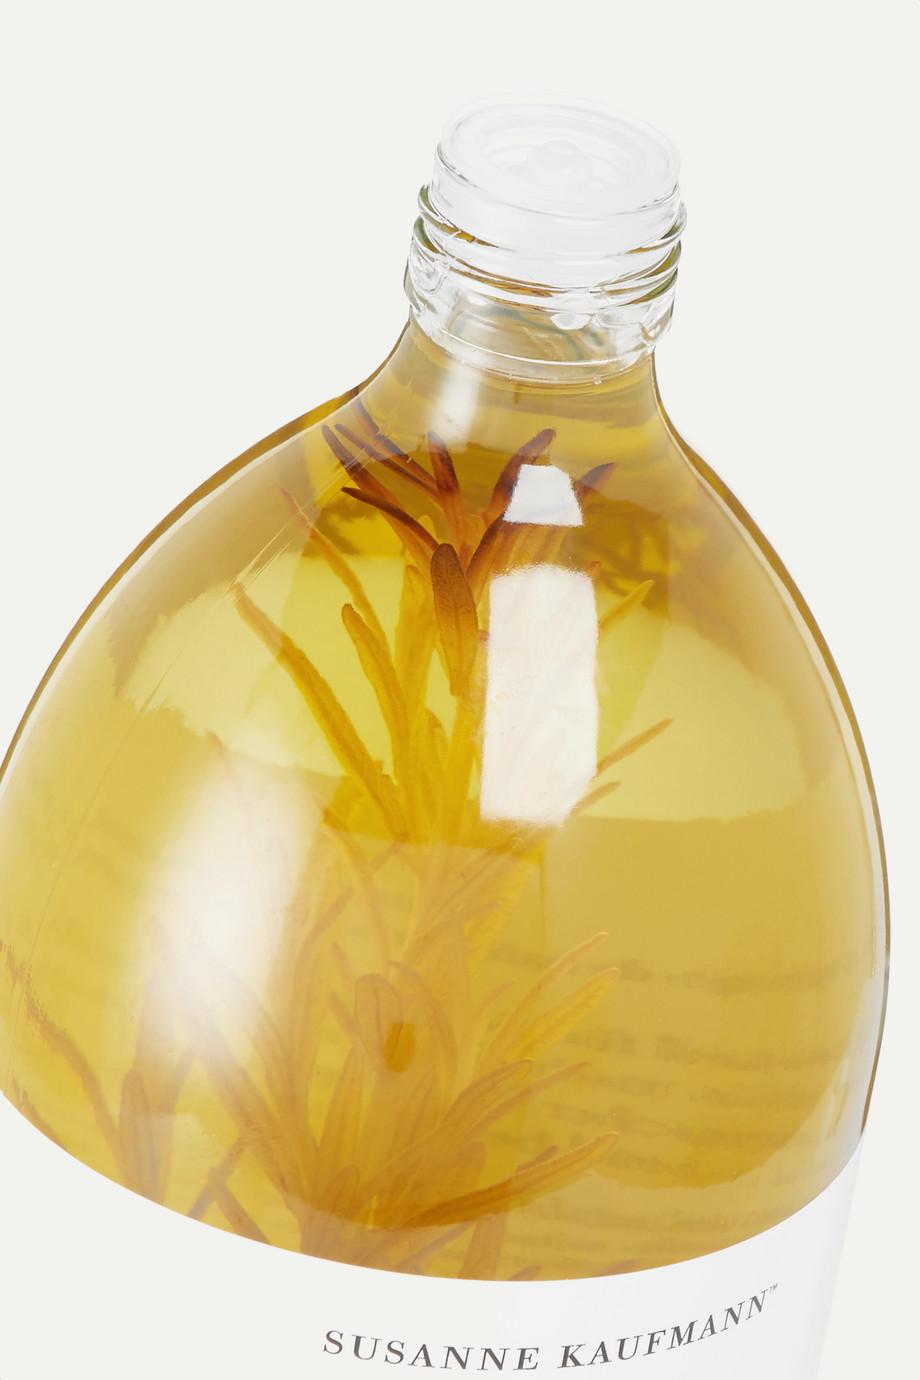 Susanne Kaufmann Essential Bath Oil For The Senses, 1000 ml – Badeöl